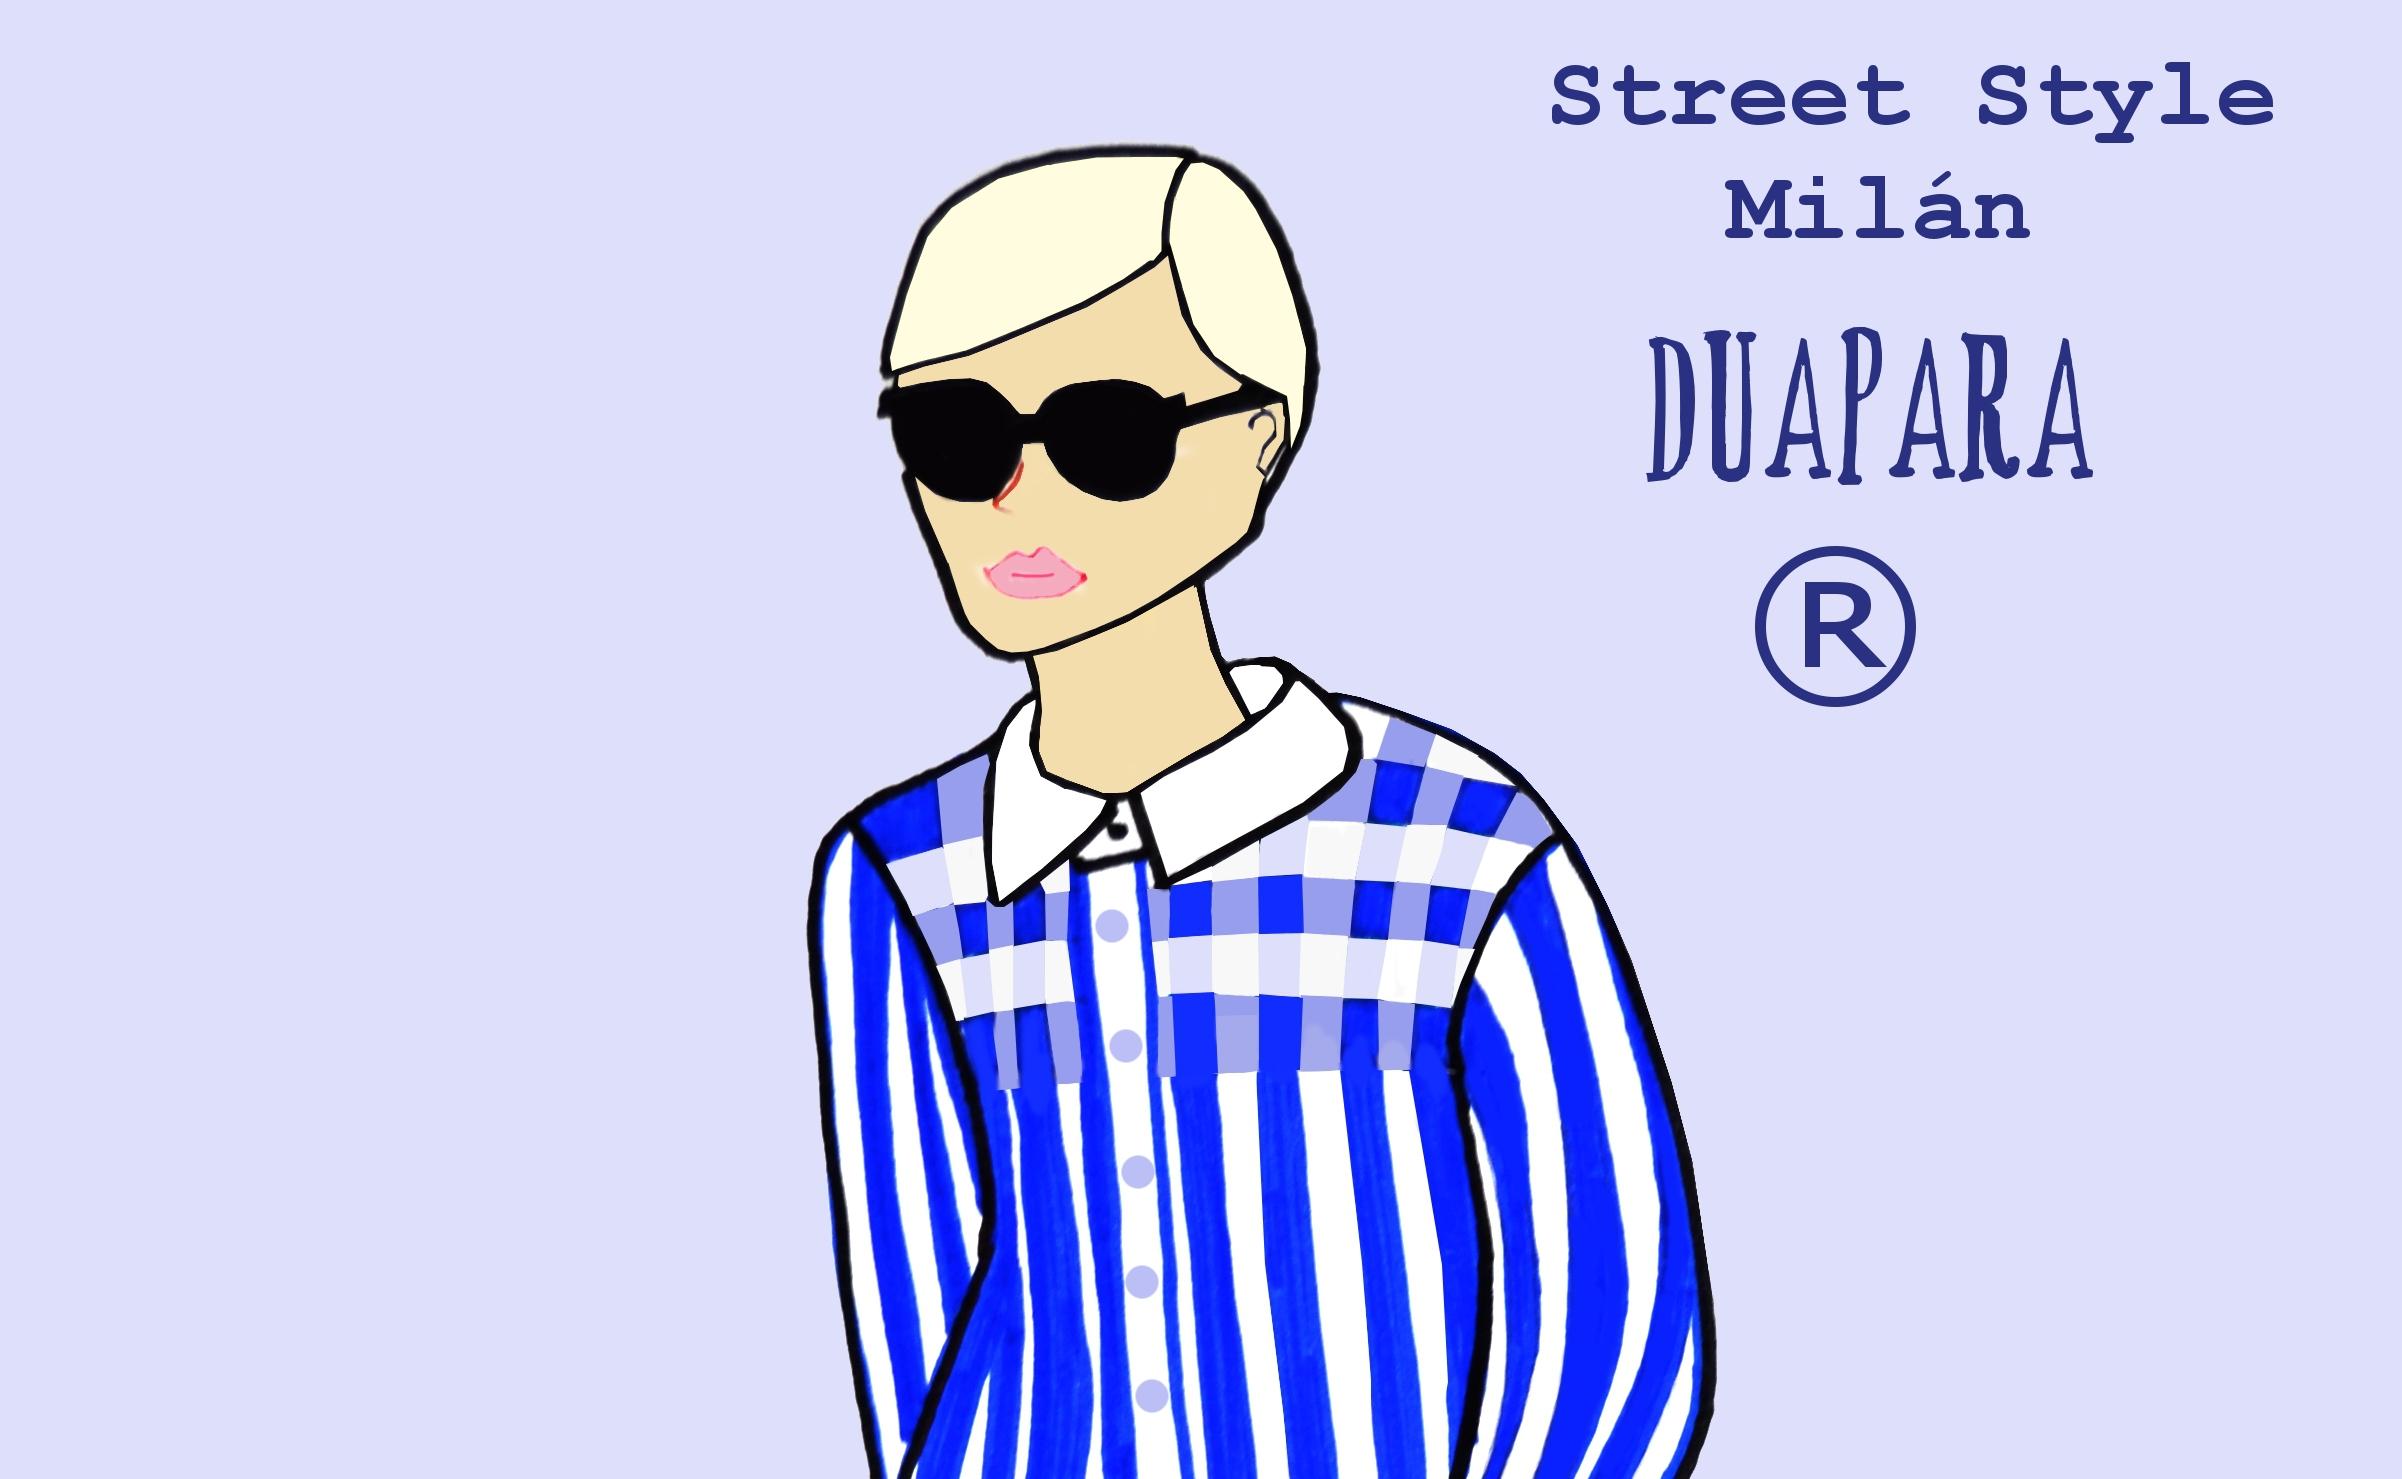 MILAN_IlustracionSS_duapara_®_mitad